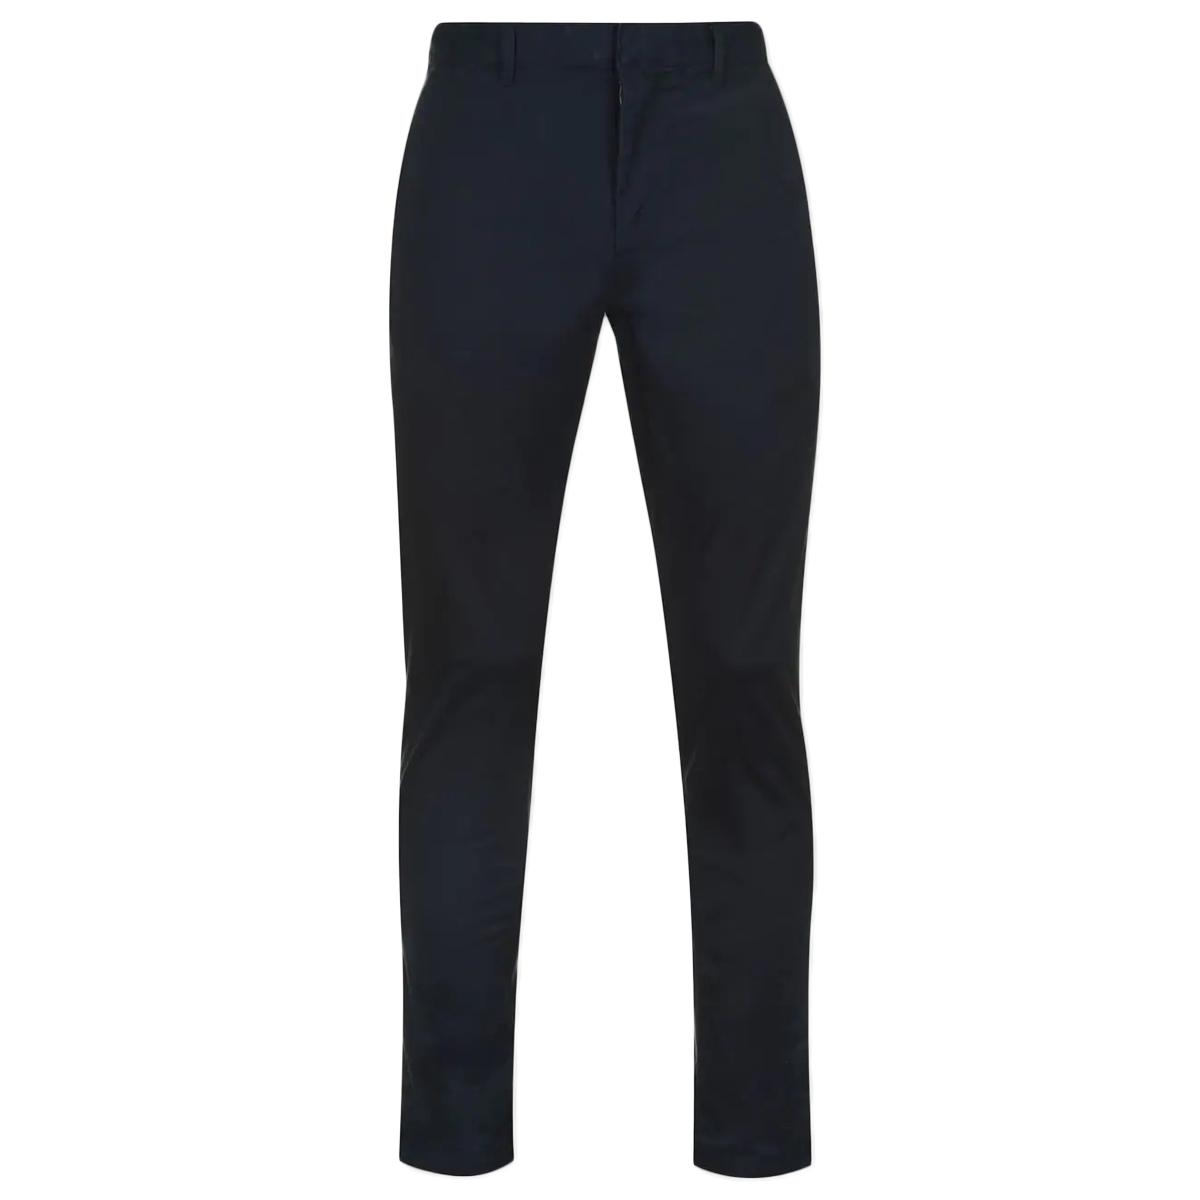 Jack Wills Men's Ellsmere Slim Chino Pants - Black, 32/R